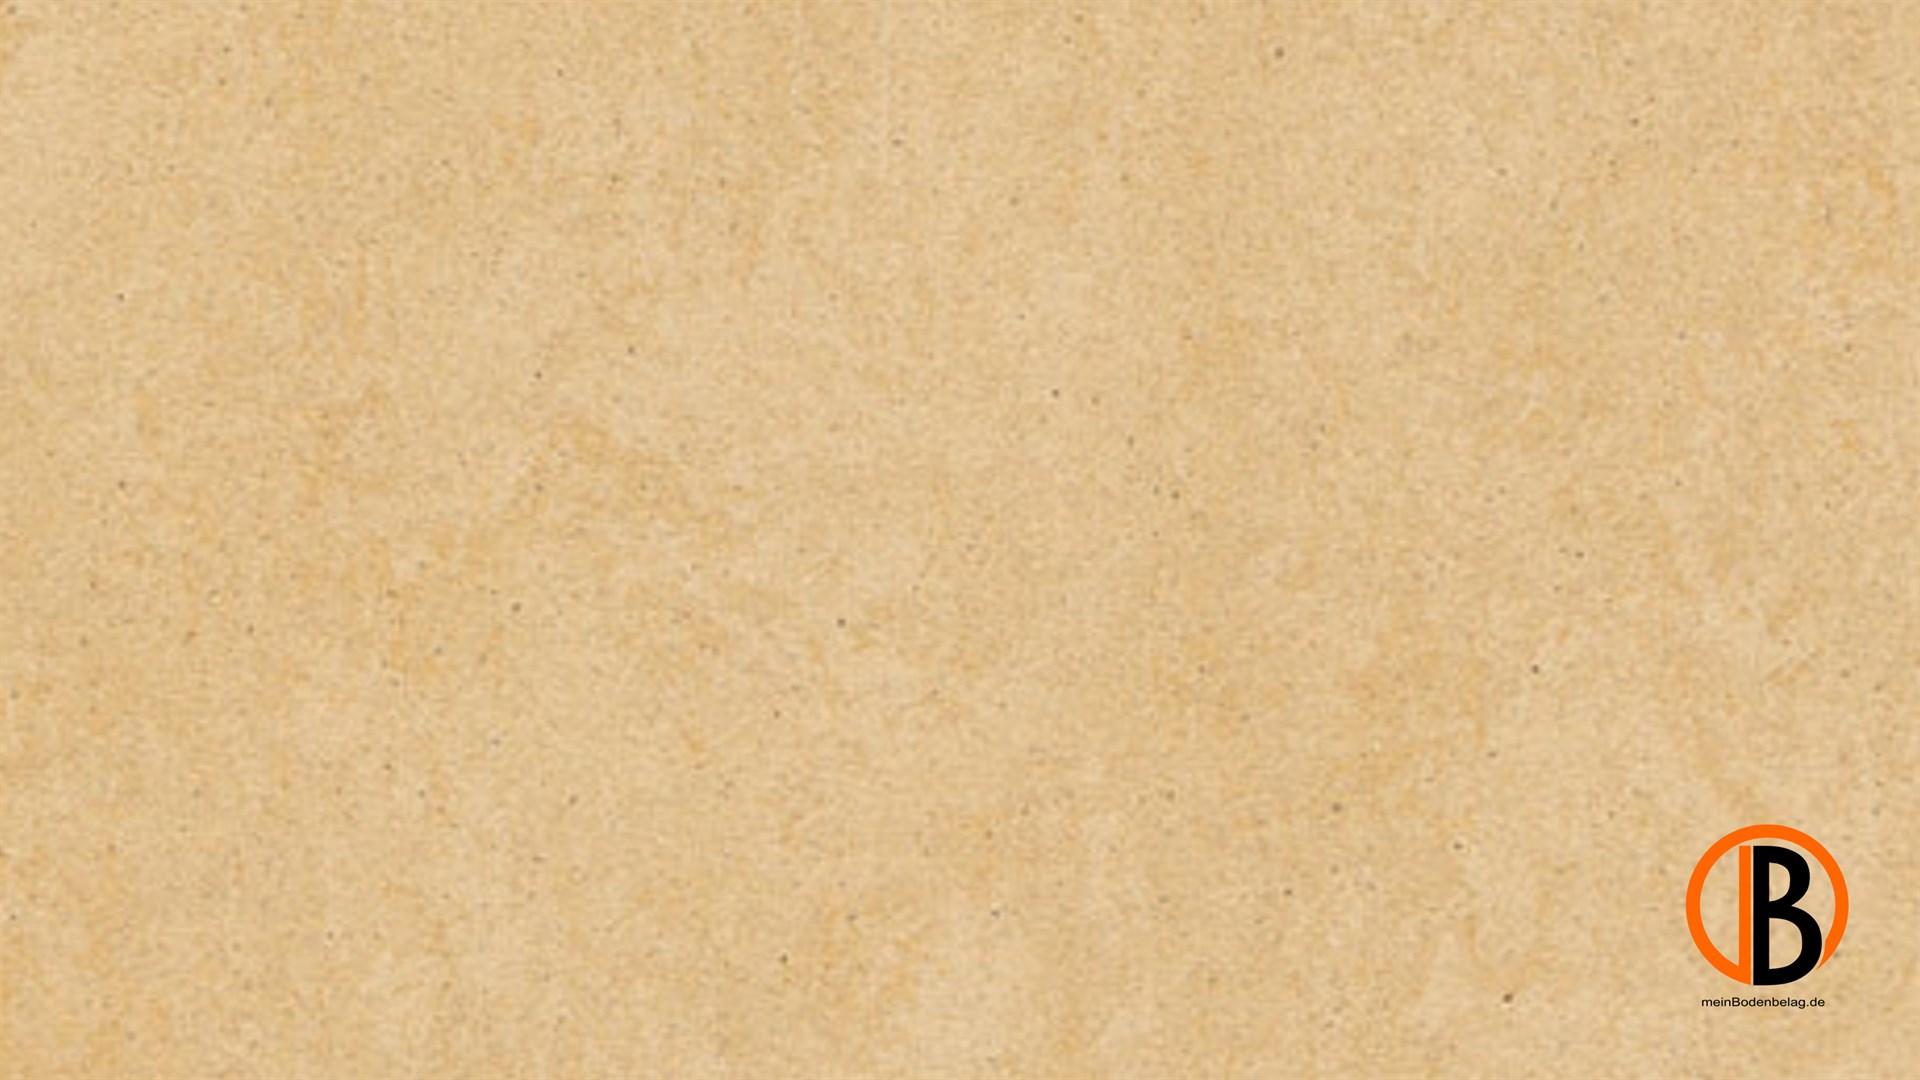 Kwg linoleum fertigparkett picolino vanille - Linoleum holzdekor ...